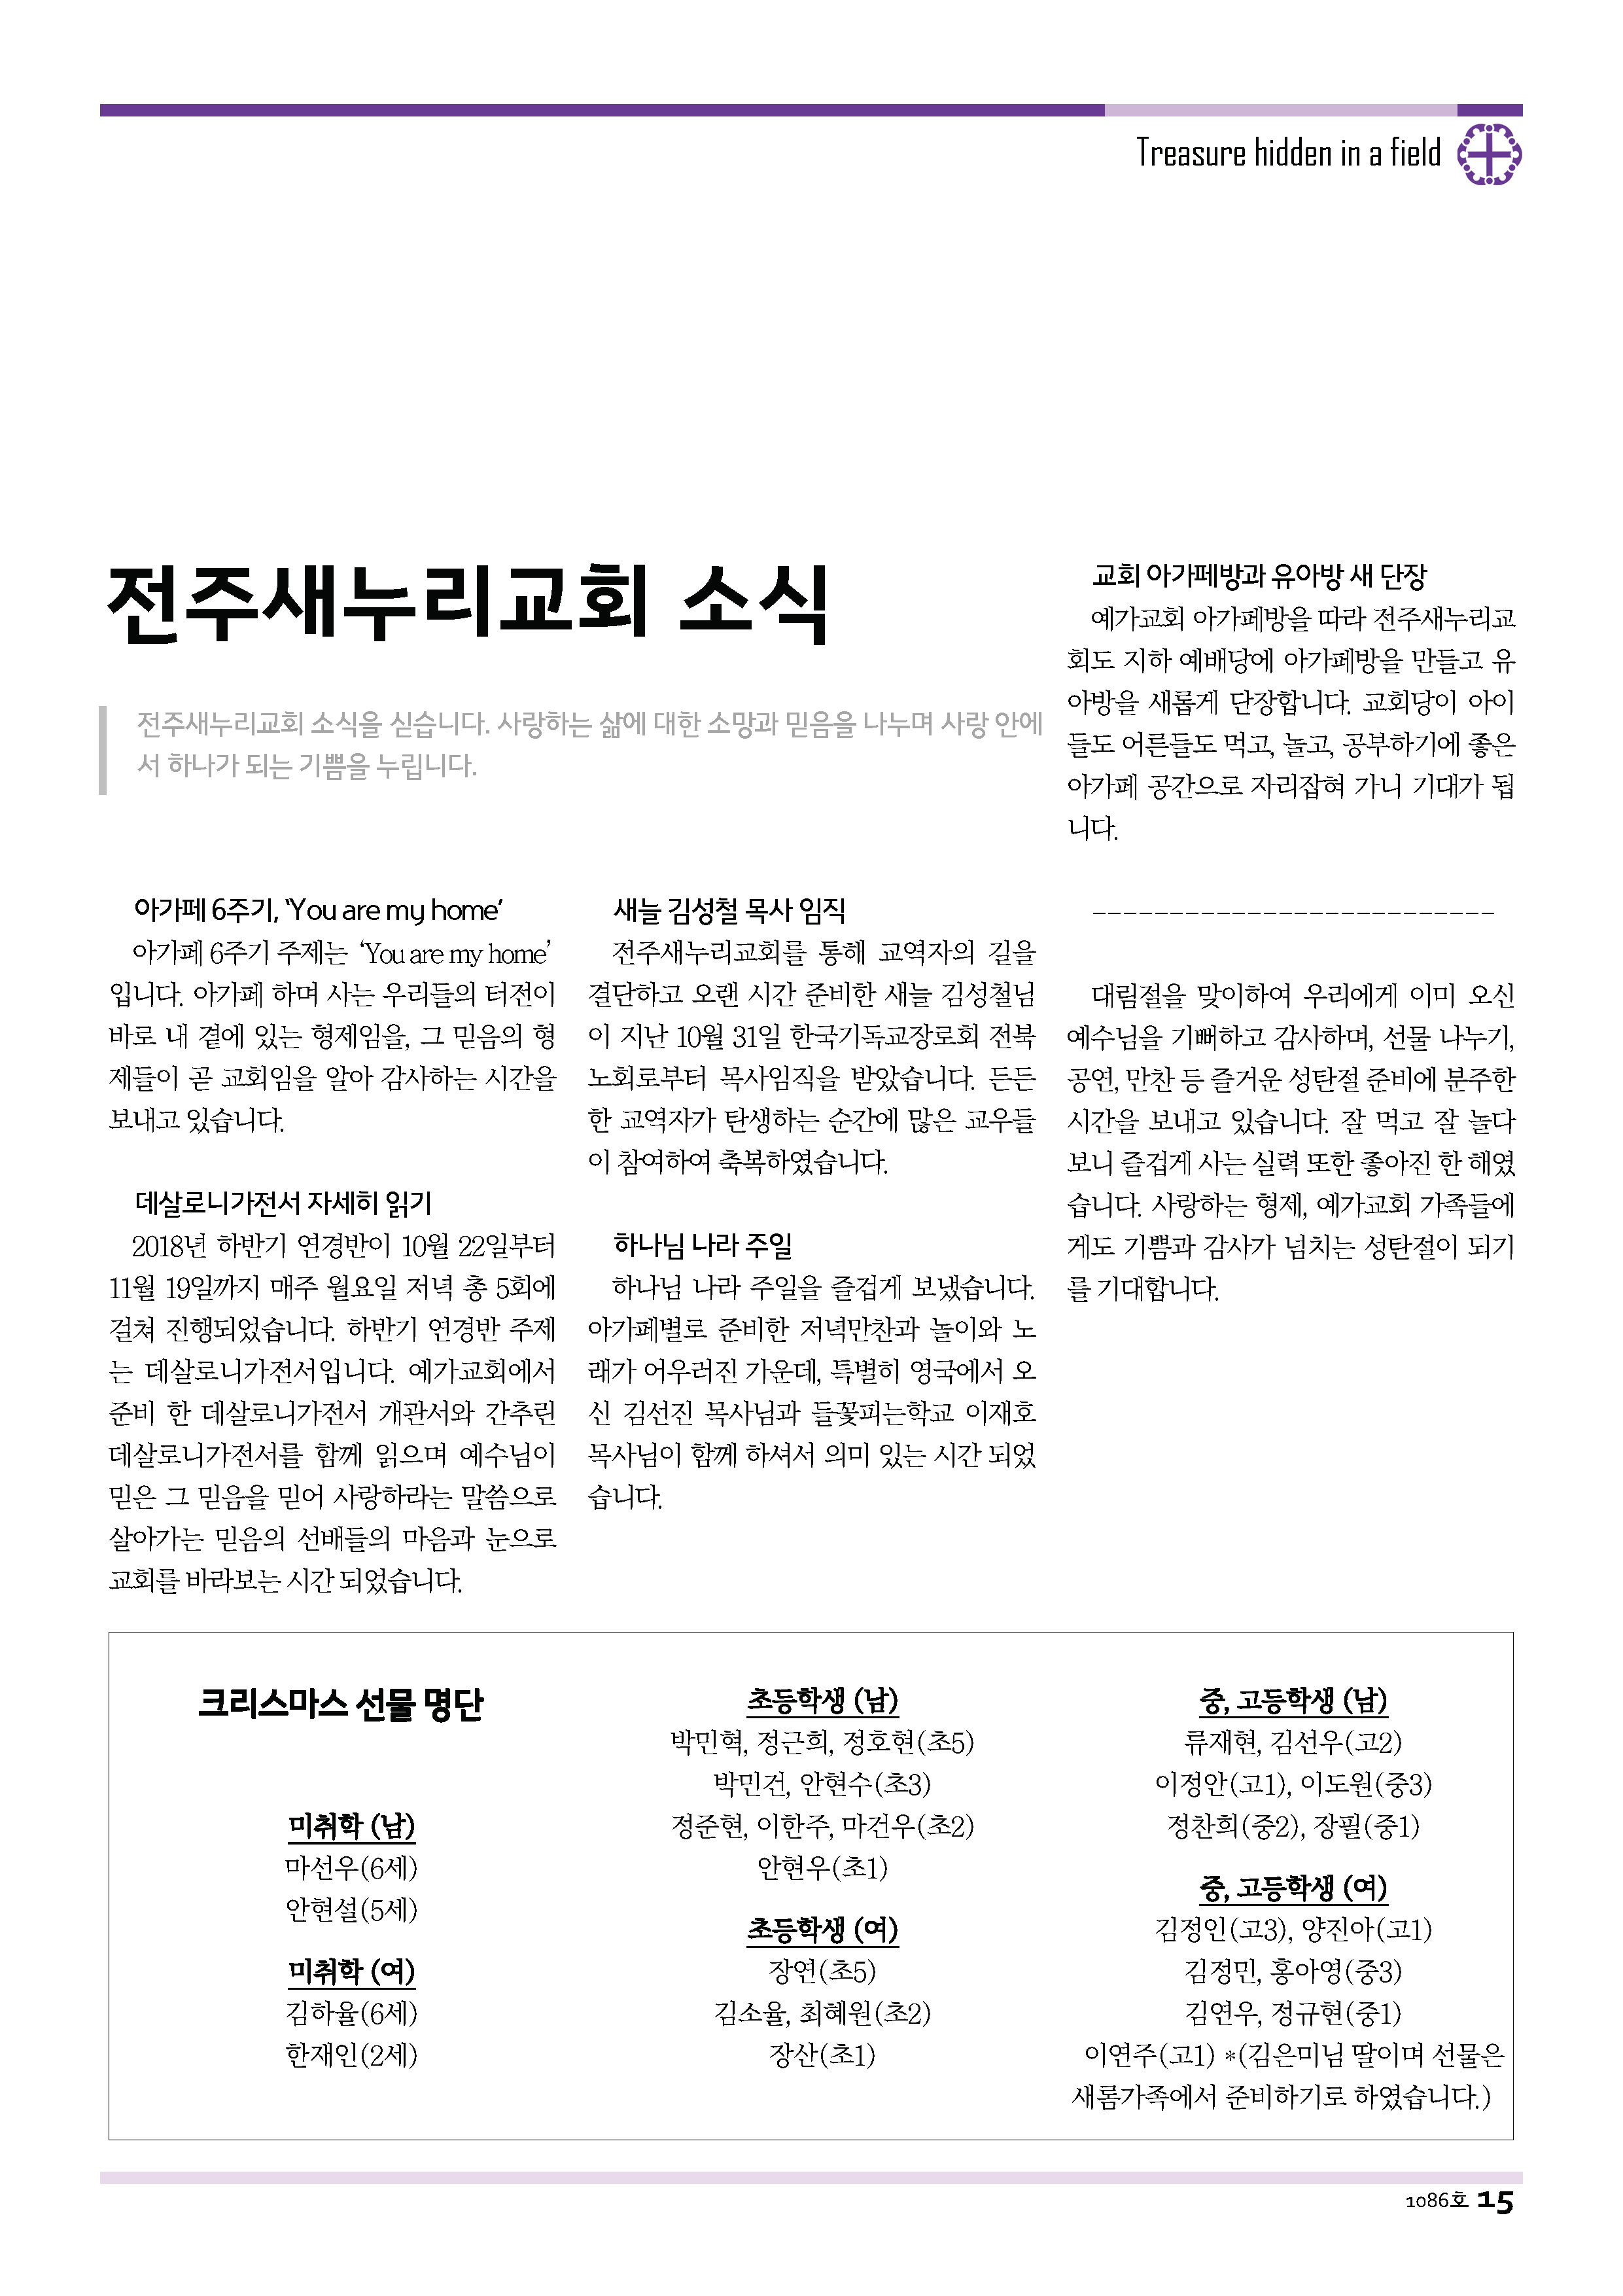 18sdjb1223_페이지_15.png